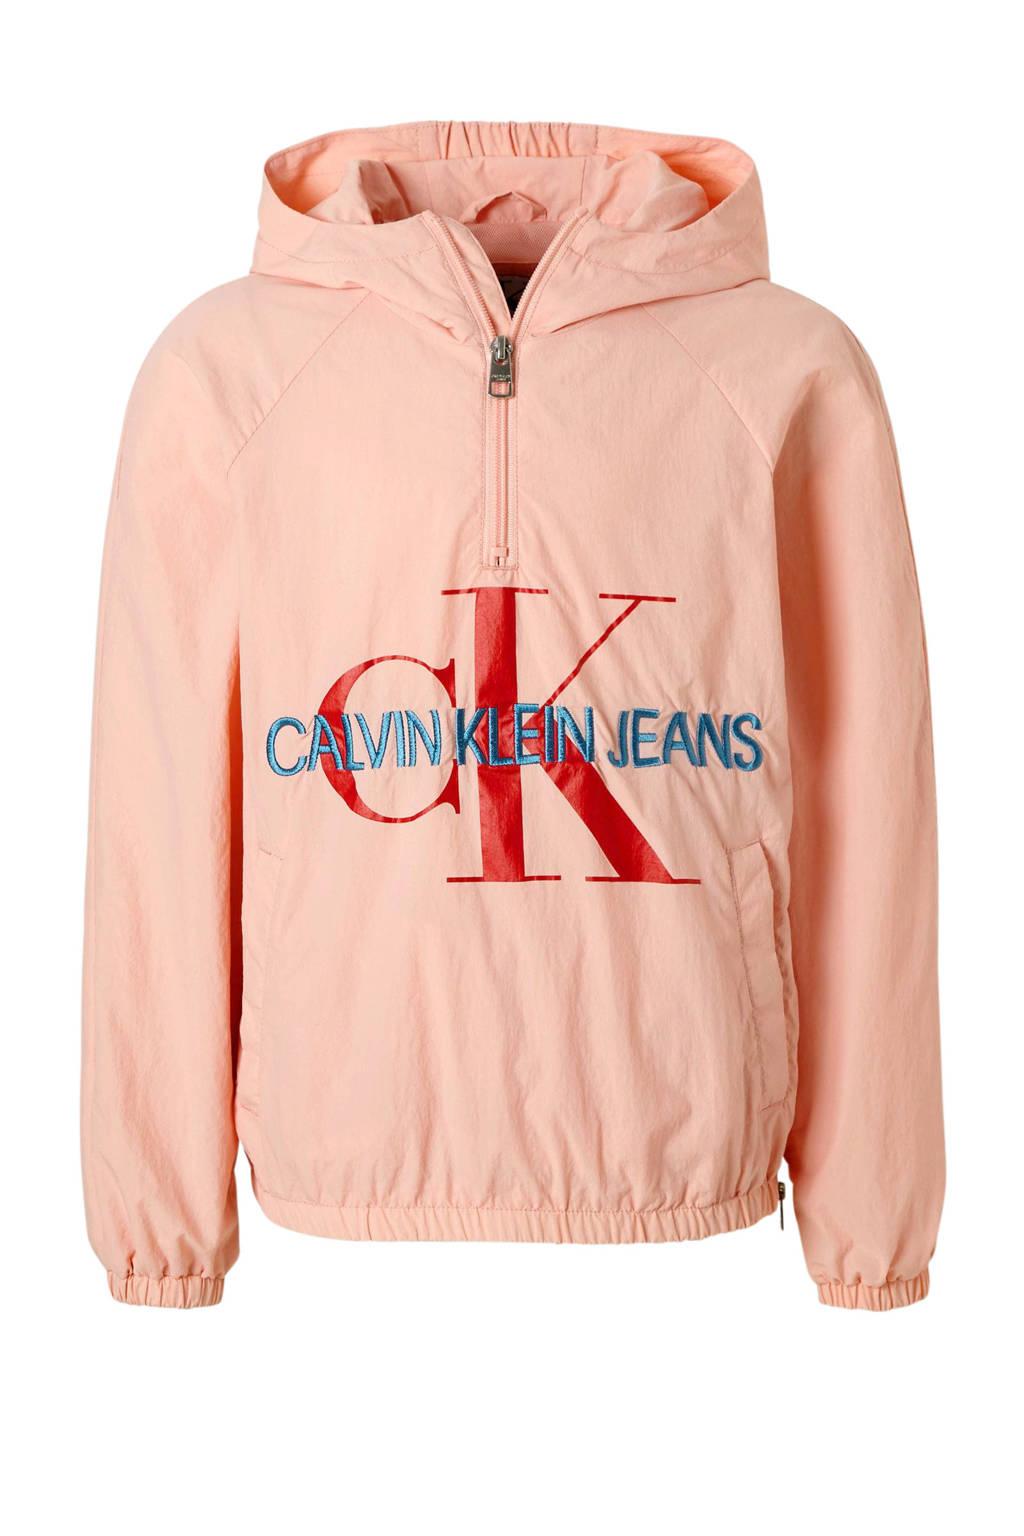 Calvin Klein Jeans anorak met logo zalmroze, Zalmroze